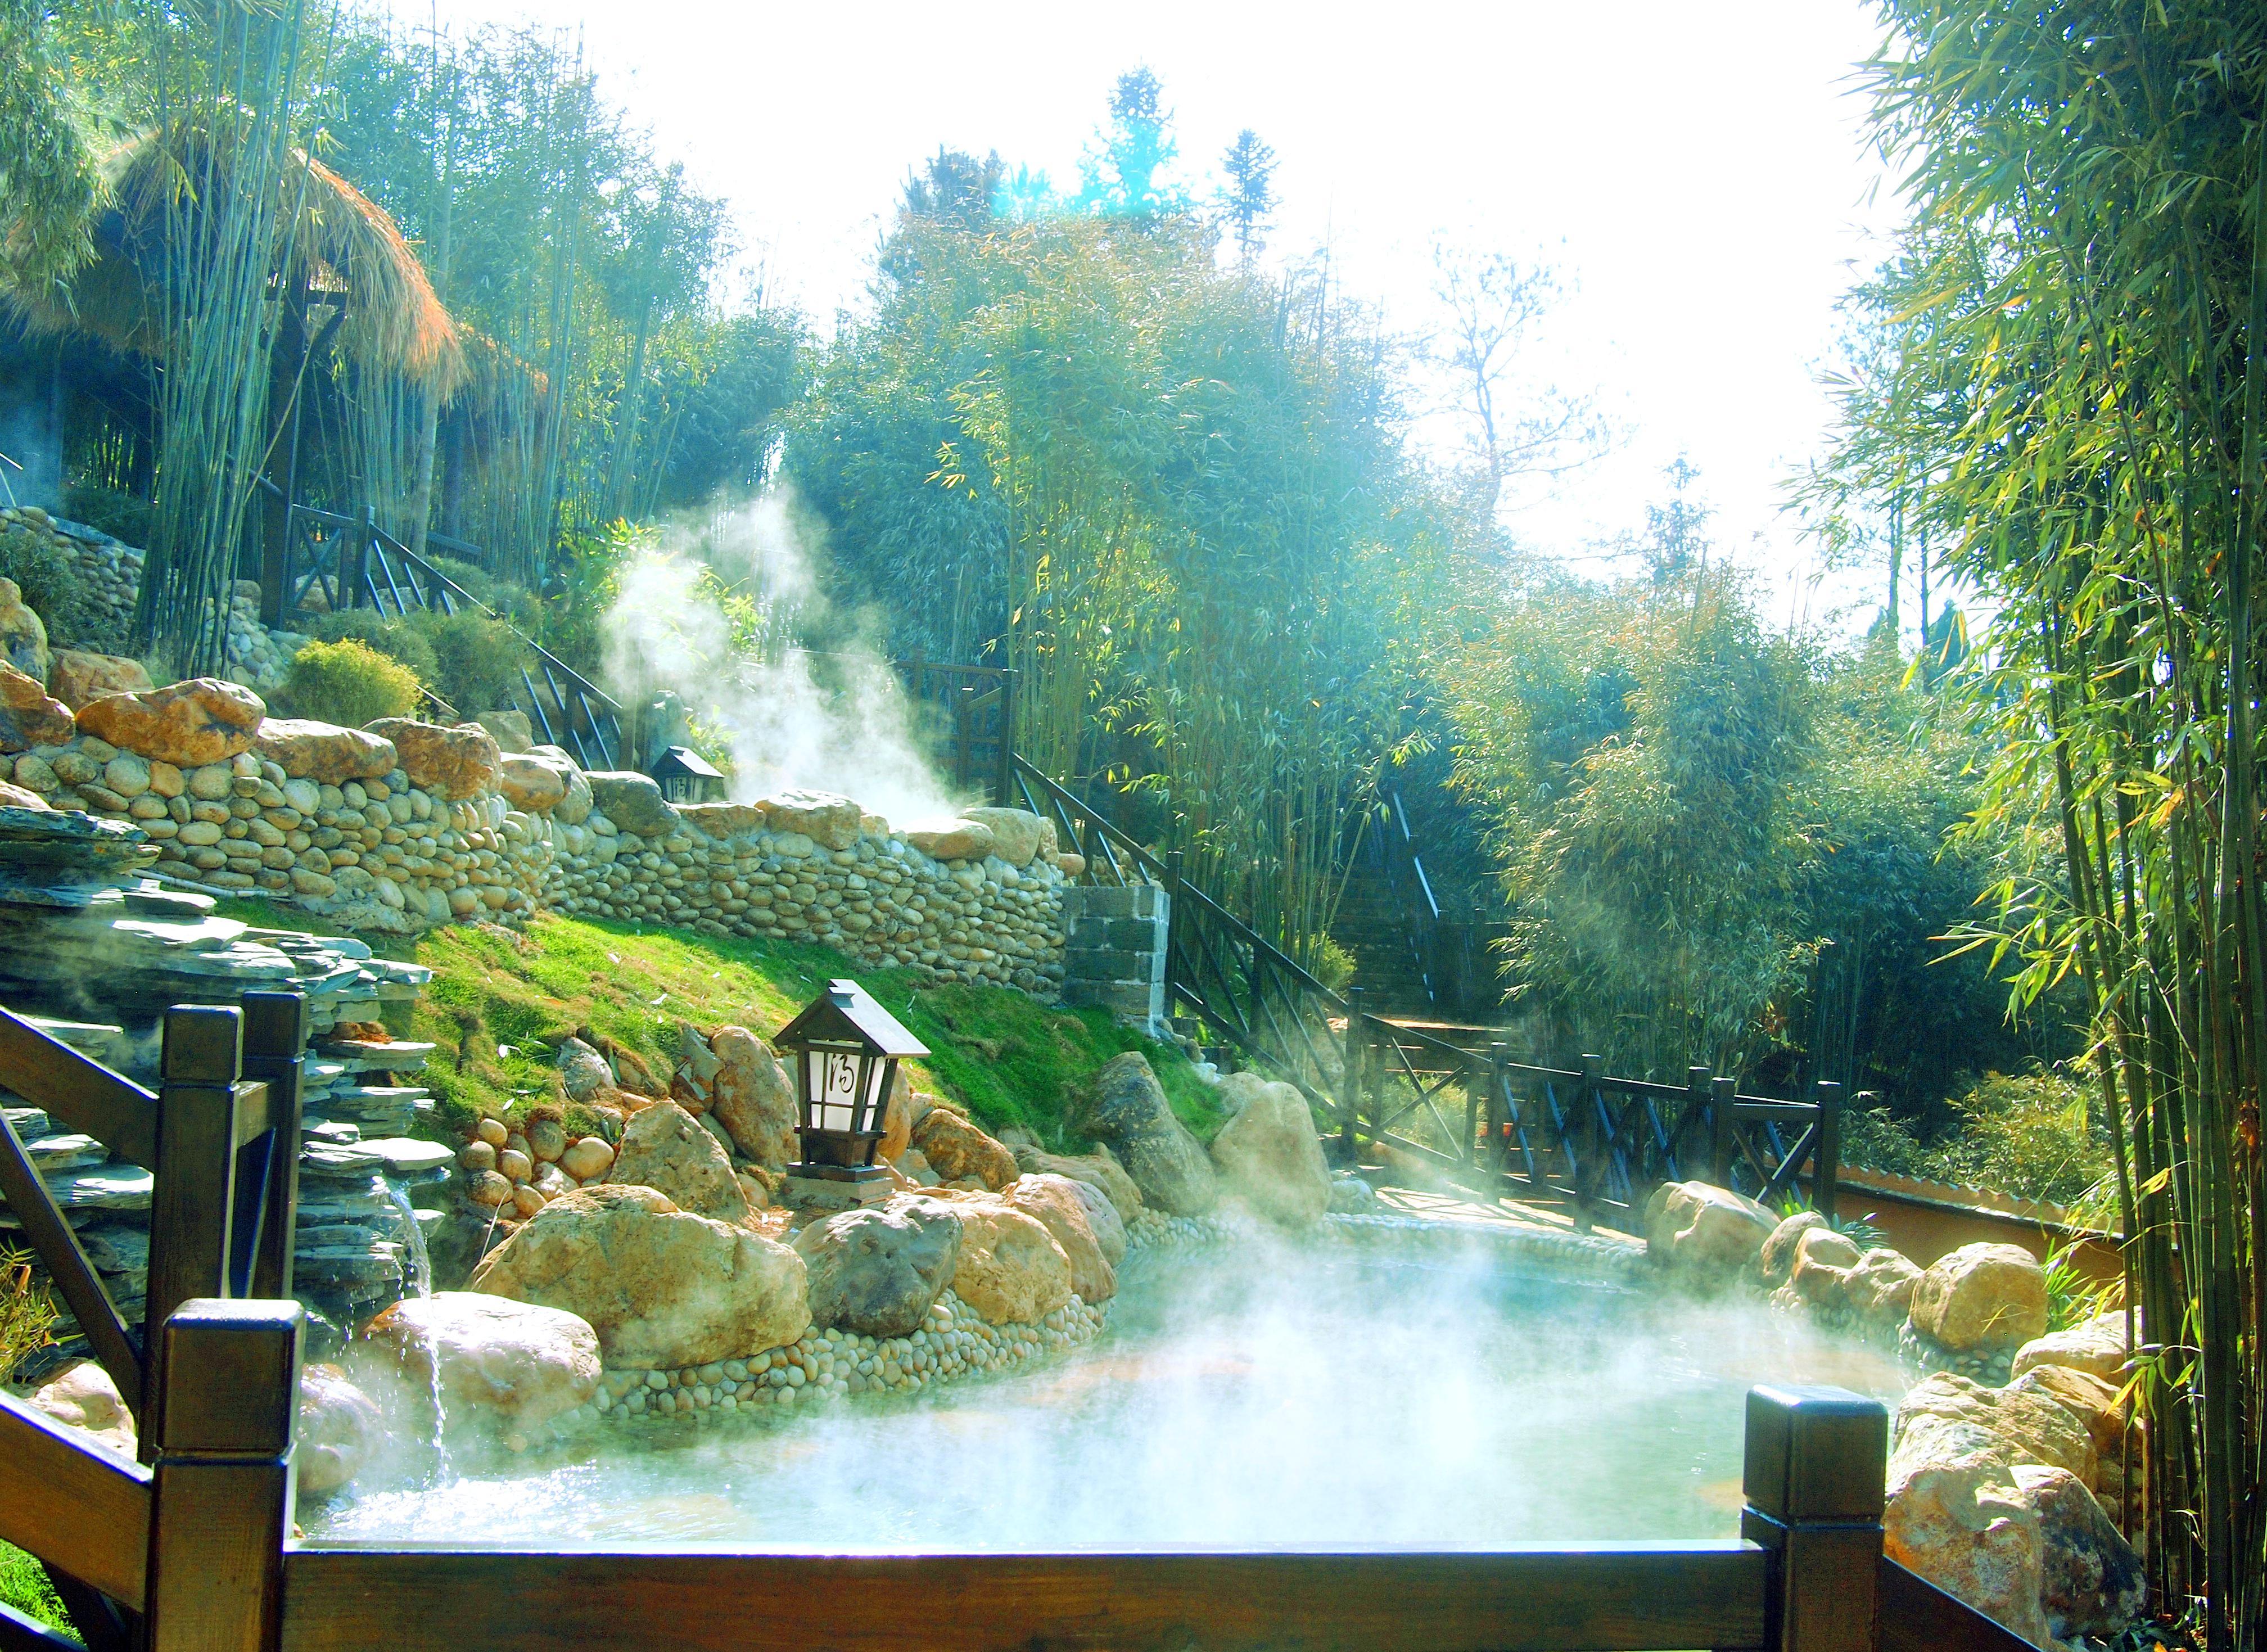 Chongyang Langkou Forest Hot Spring